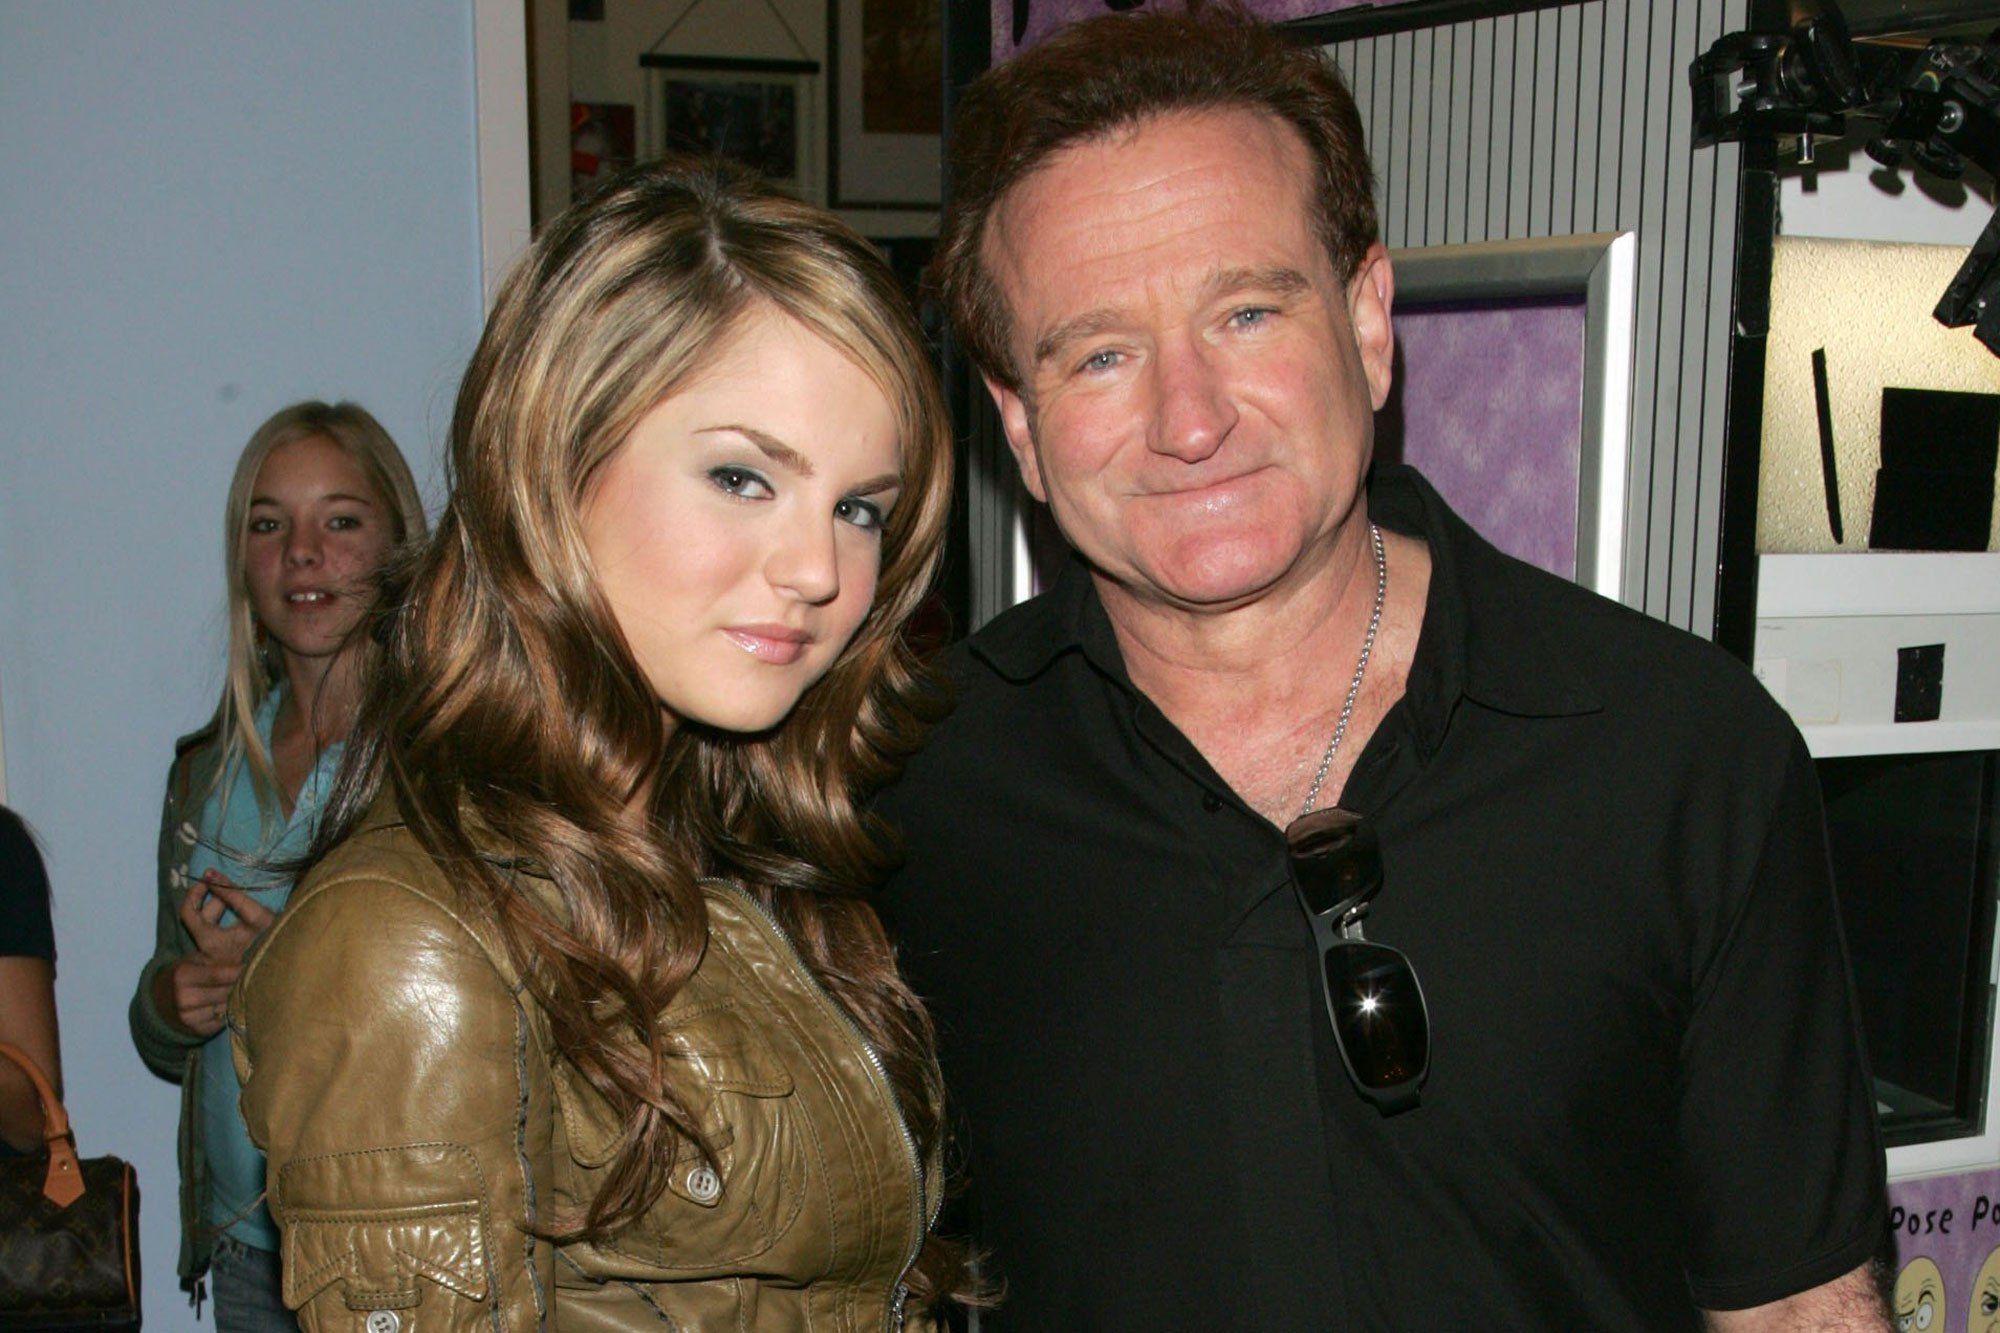 Jojo Remembers Inspiring Rv Costar Robin Williams Talks Friendship With Zelda Williams Robin Williams Zelda Williams Famous People Celebrities